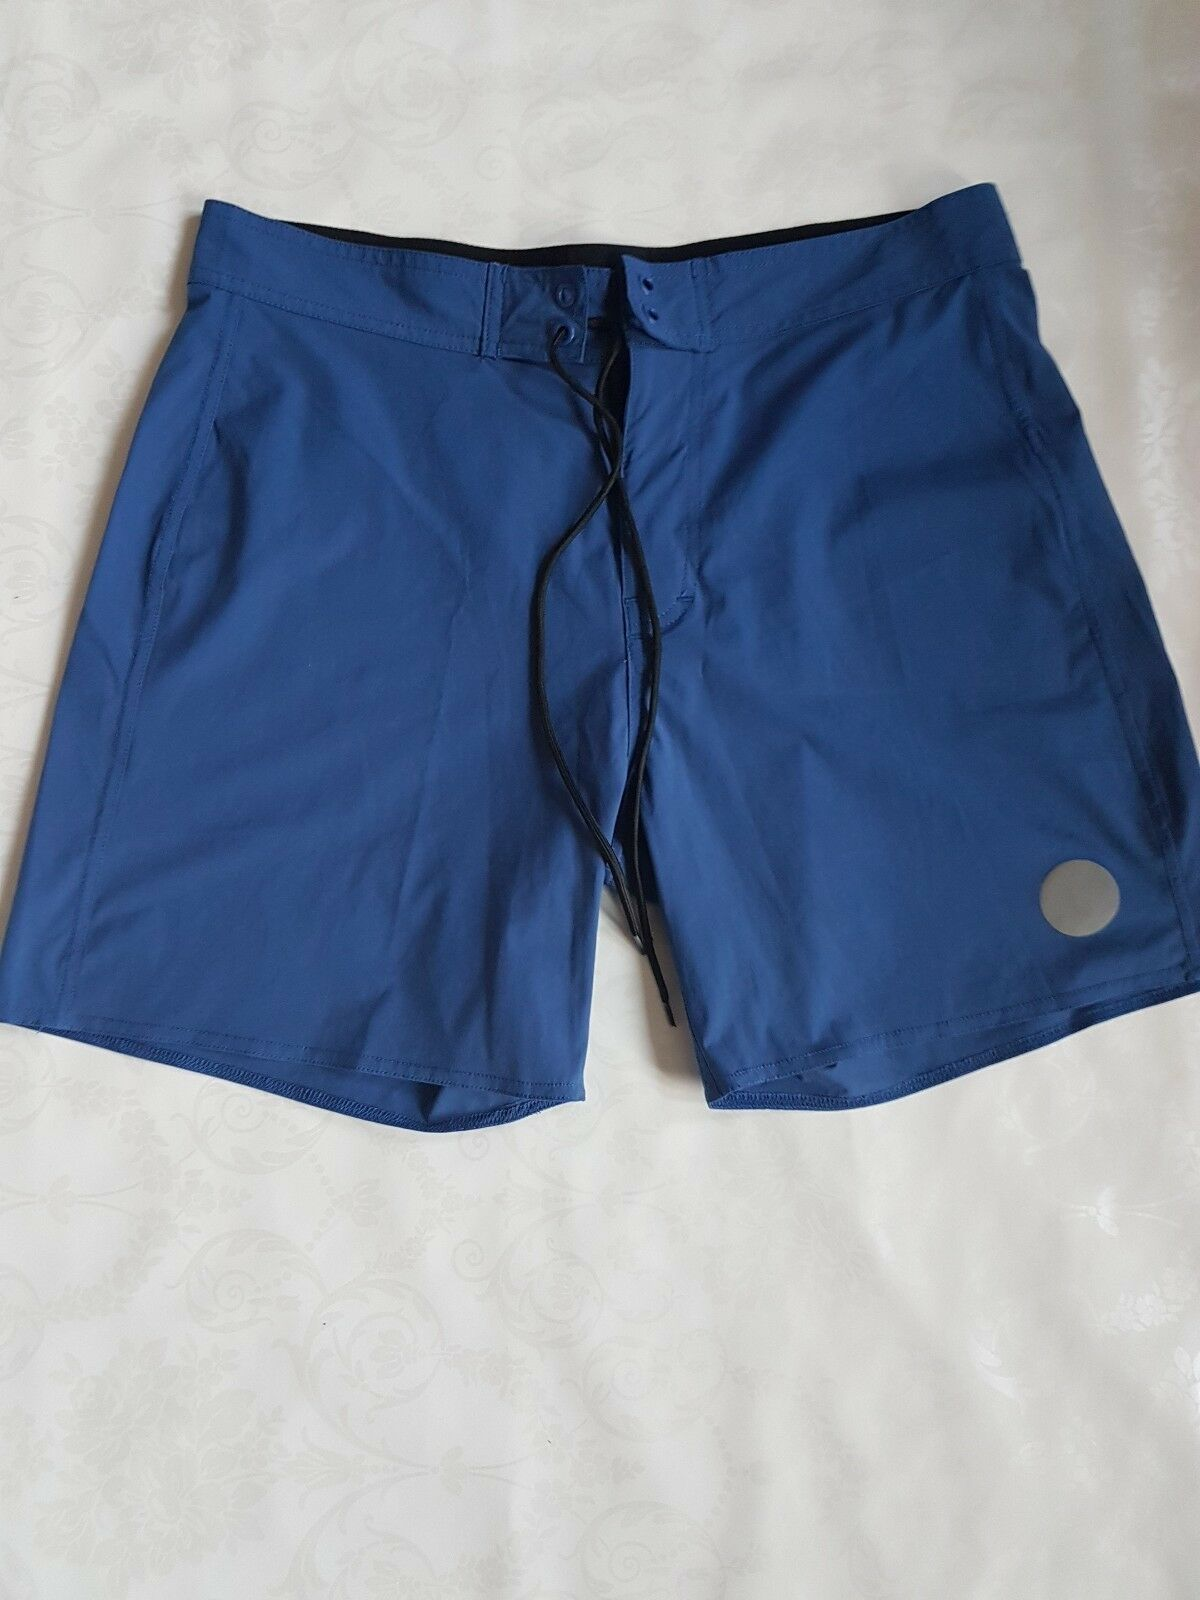 Men's Designer Saturdays Surf NYC Board Swim Shorts bluee Size 30